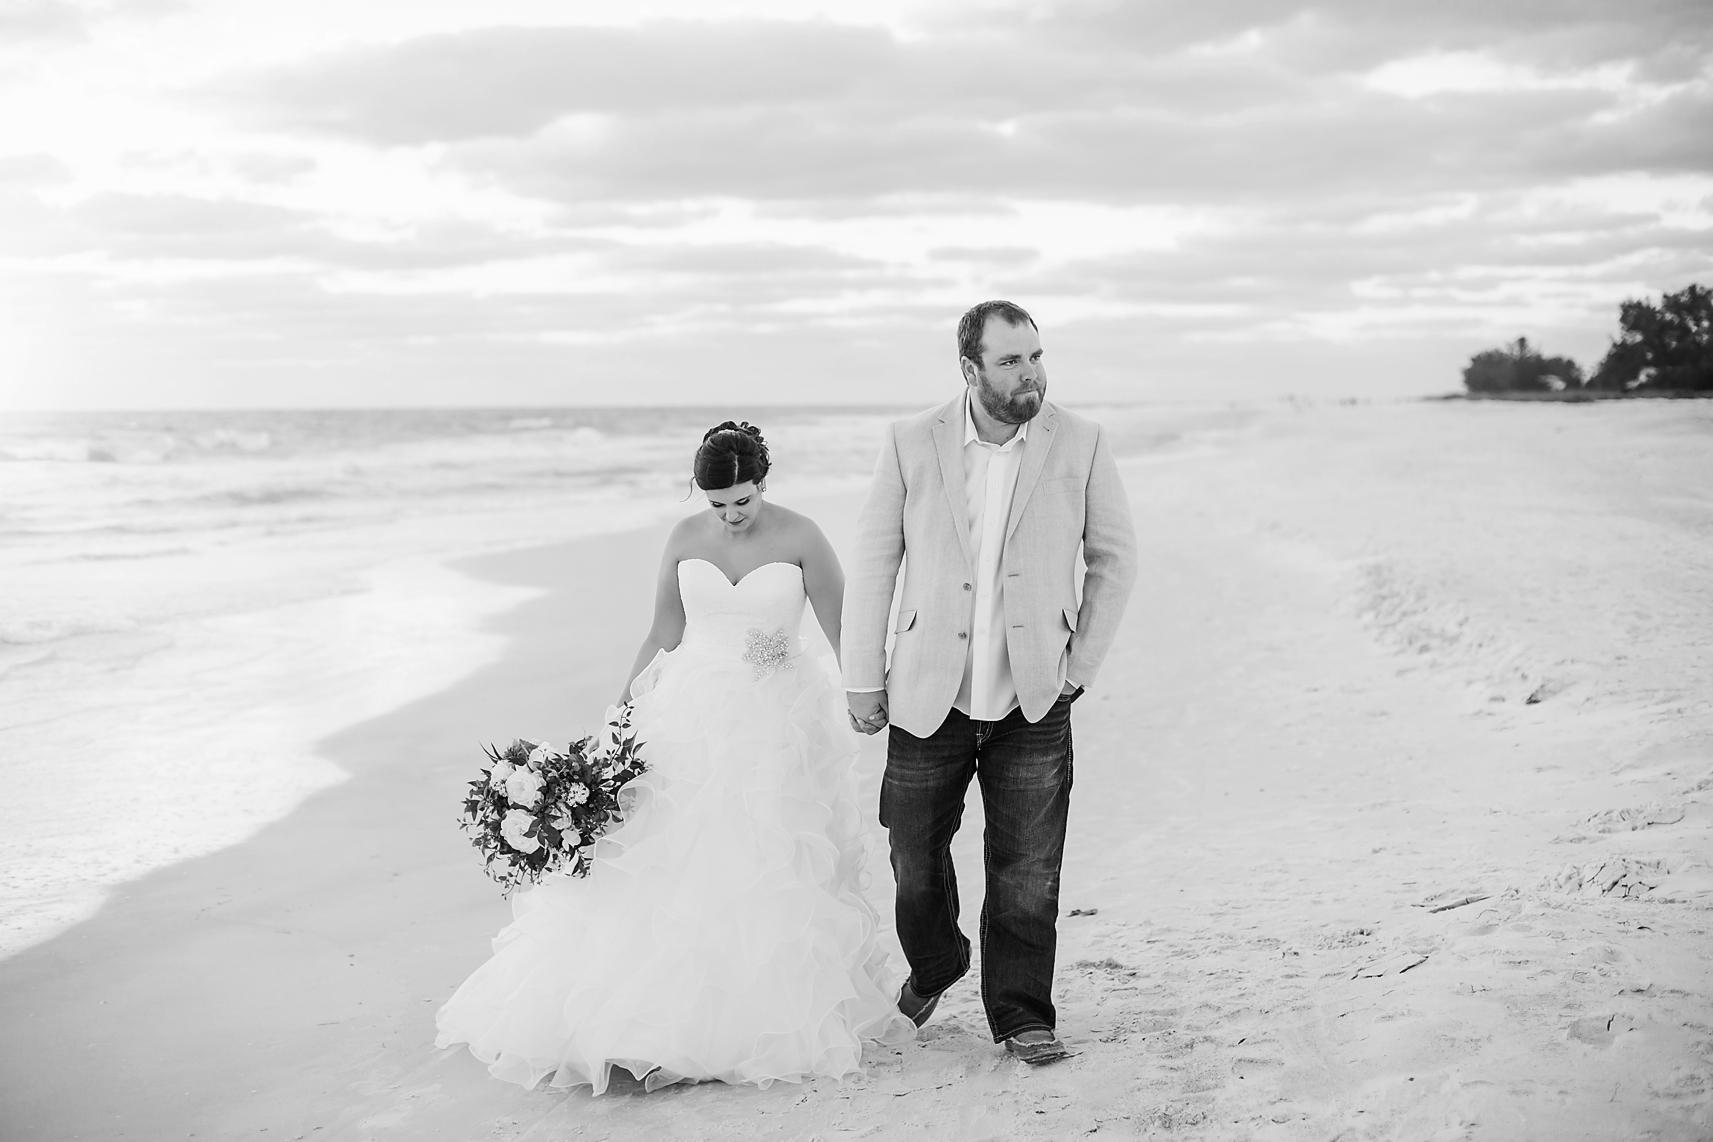 Bailey + Chalin - Anna Maria Island Wedding Photographer - Destination Wedding Photography - Emily & Co. Photography - Beach Wedding Photography 195.jpg